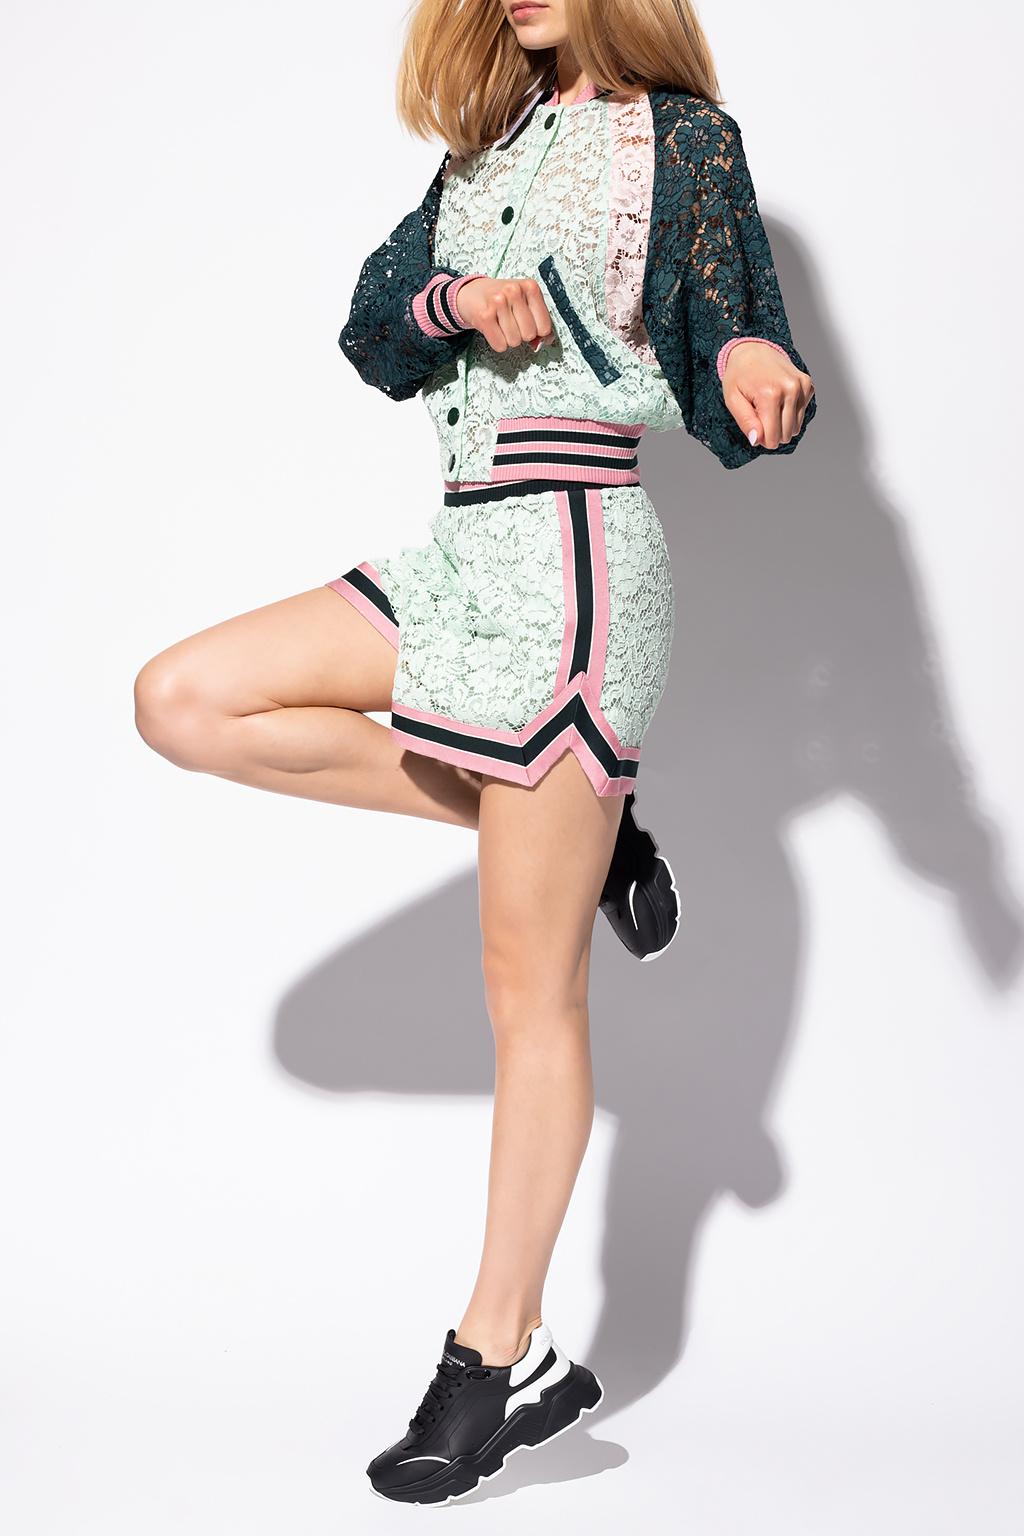 Dolce & Gabbana 蕾丝飞行员夹克